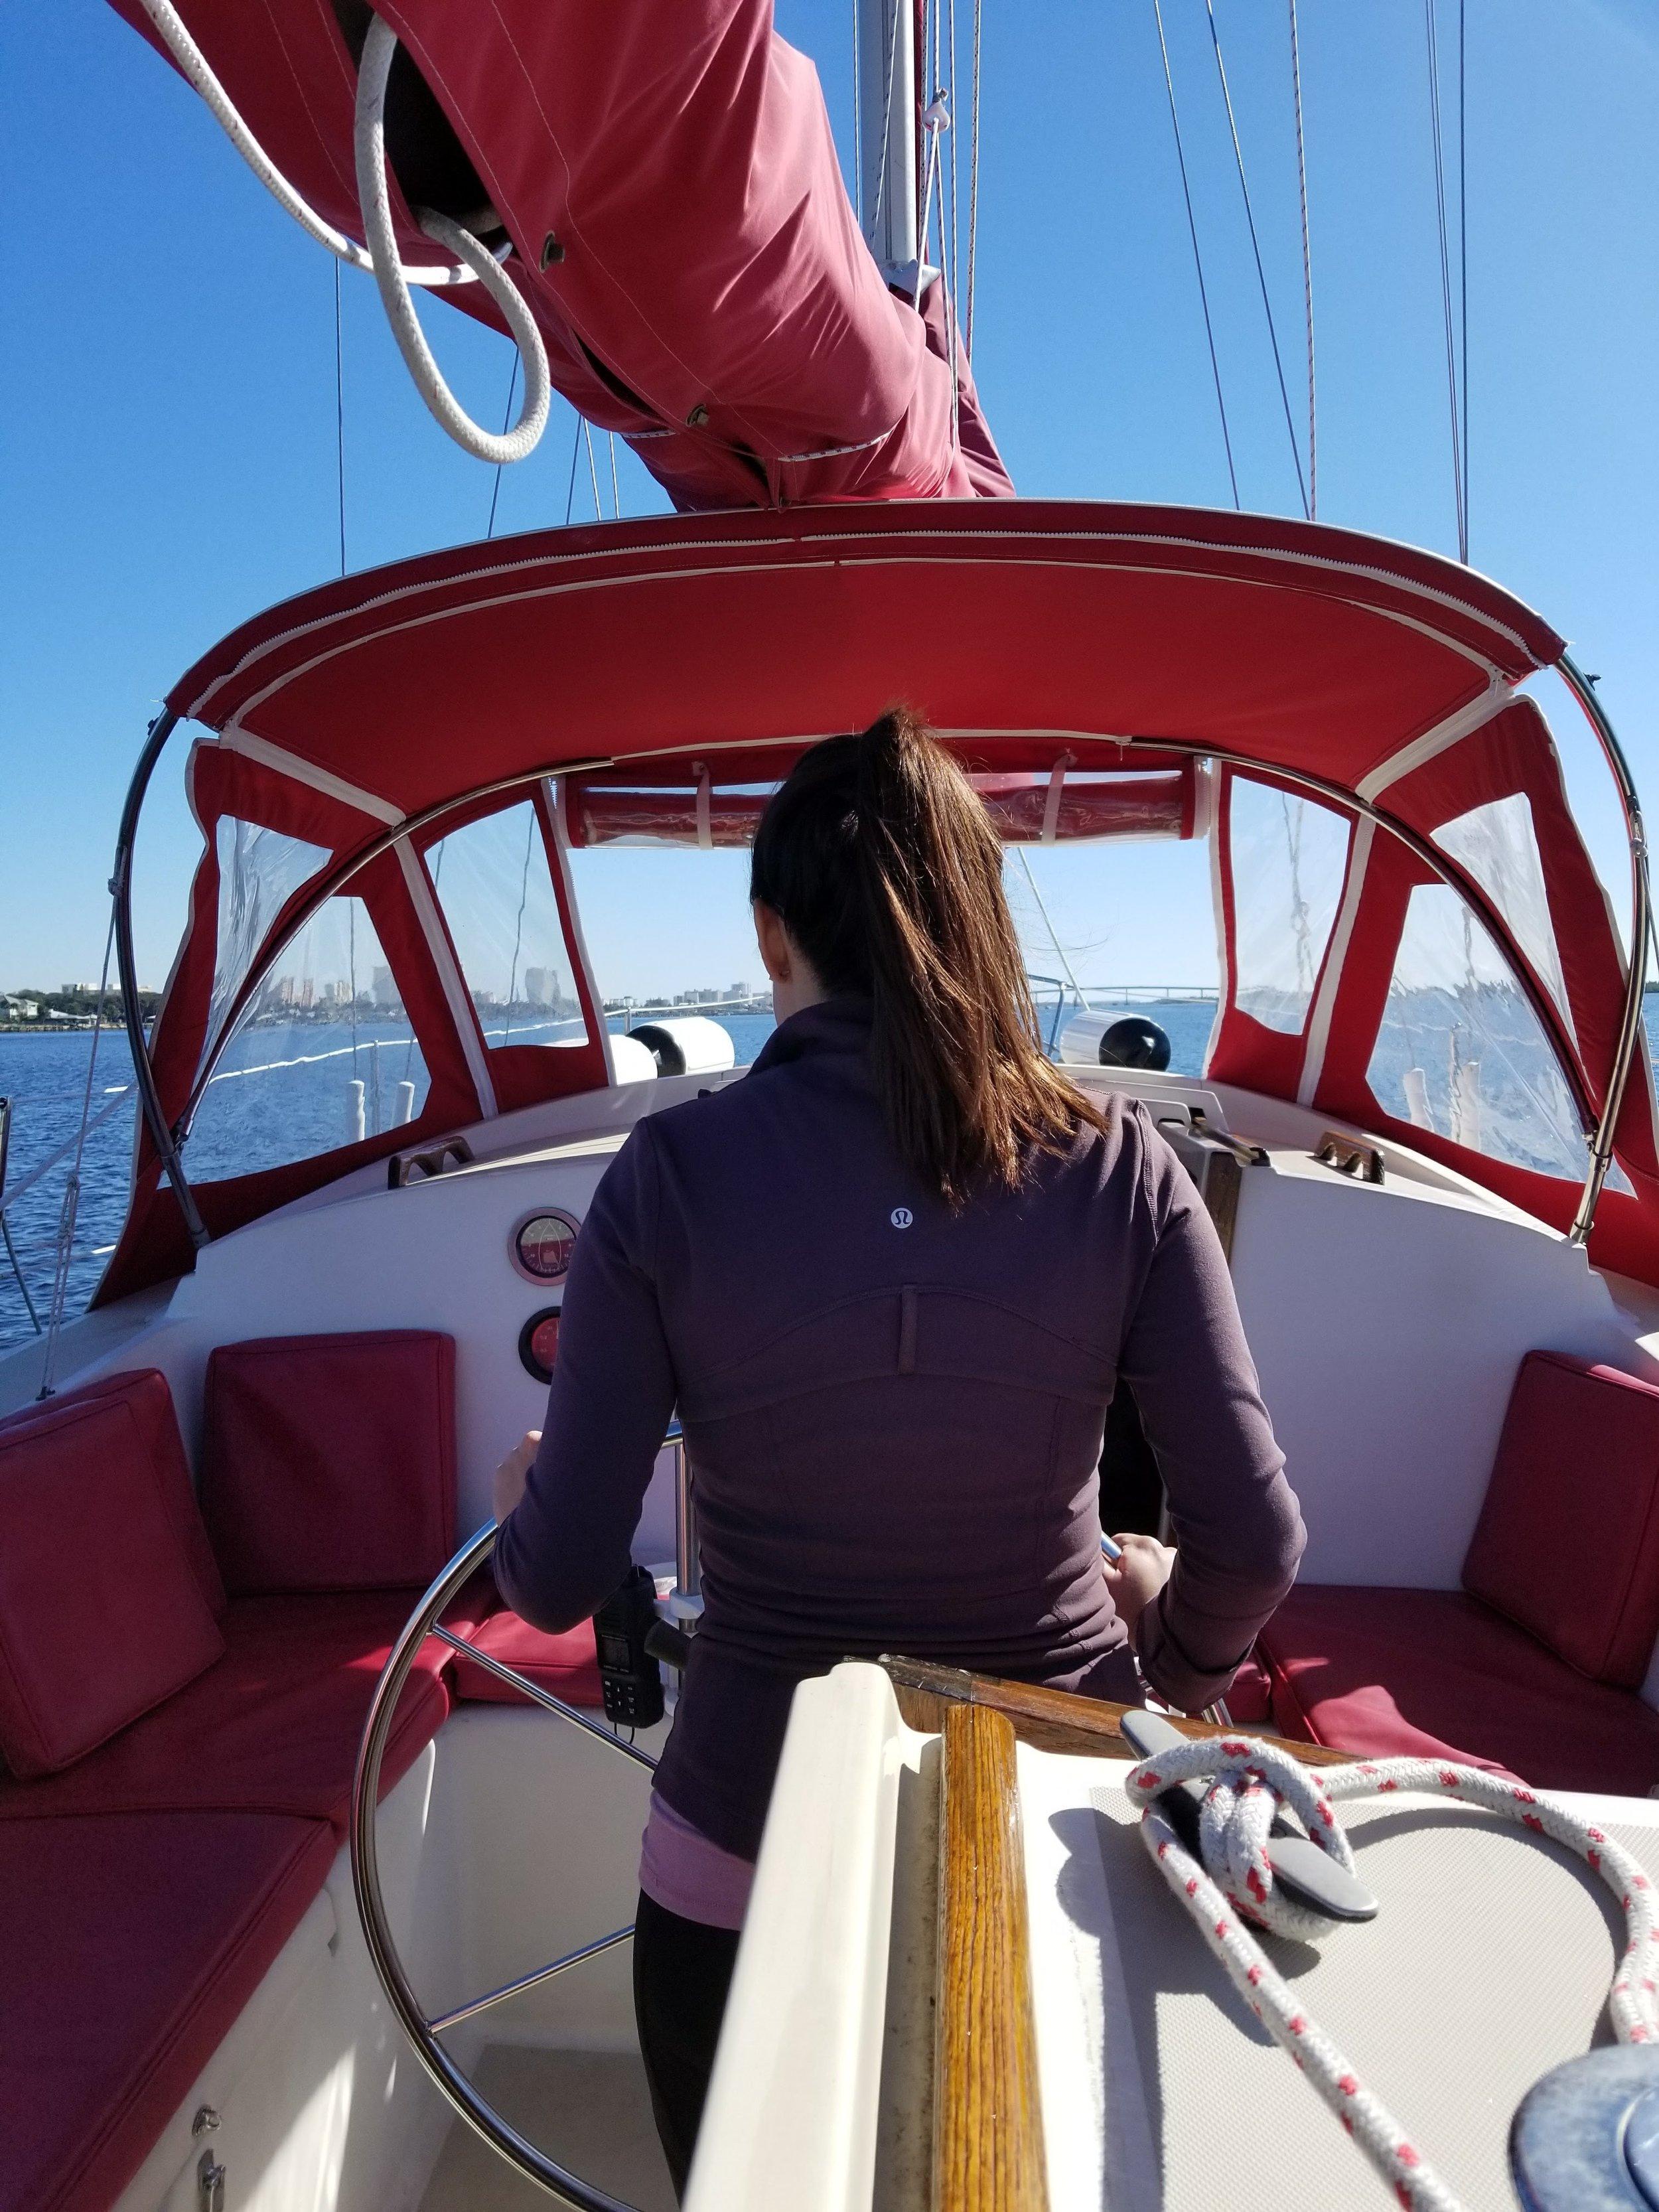 Kelsey behind the wheel headed South towards New Smyrna Beach.